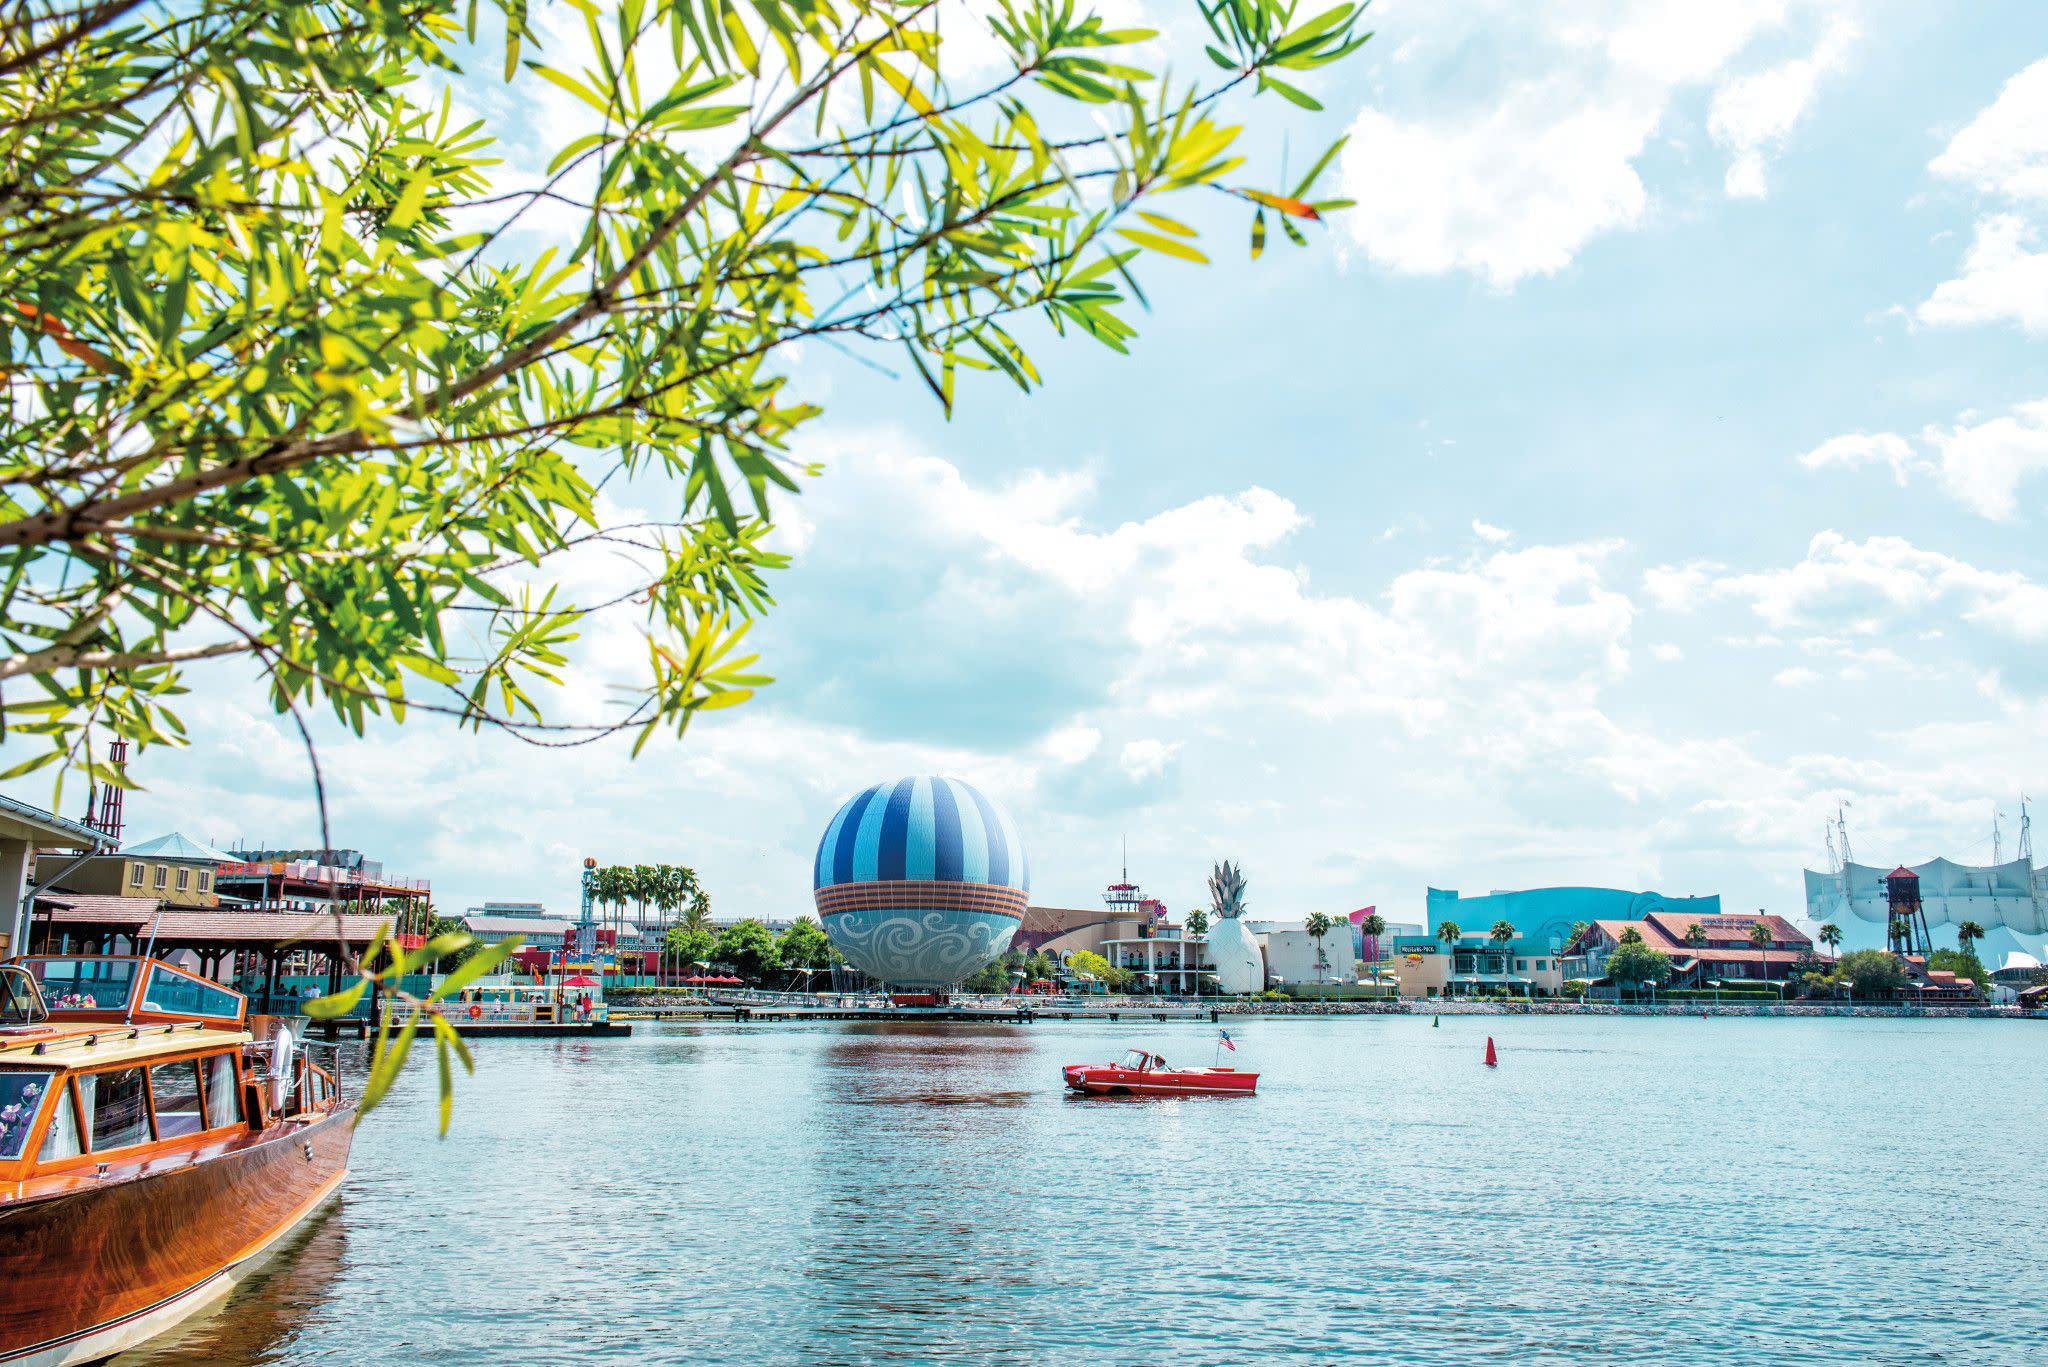 Enjoy Amphicar and Venezia Tours at Disney Springs in Orlando